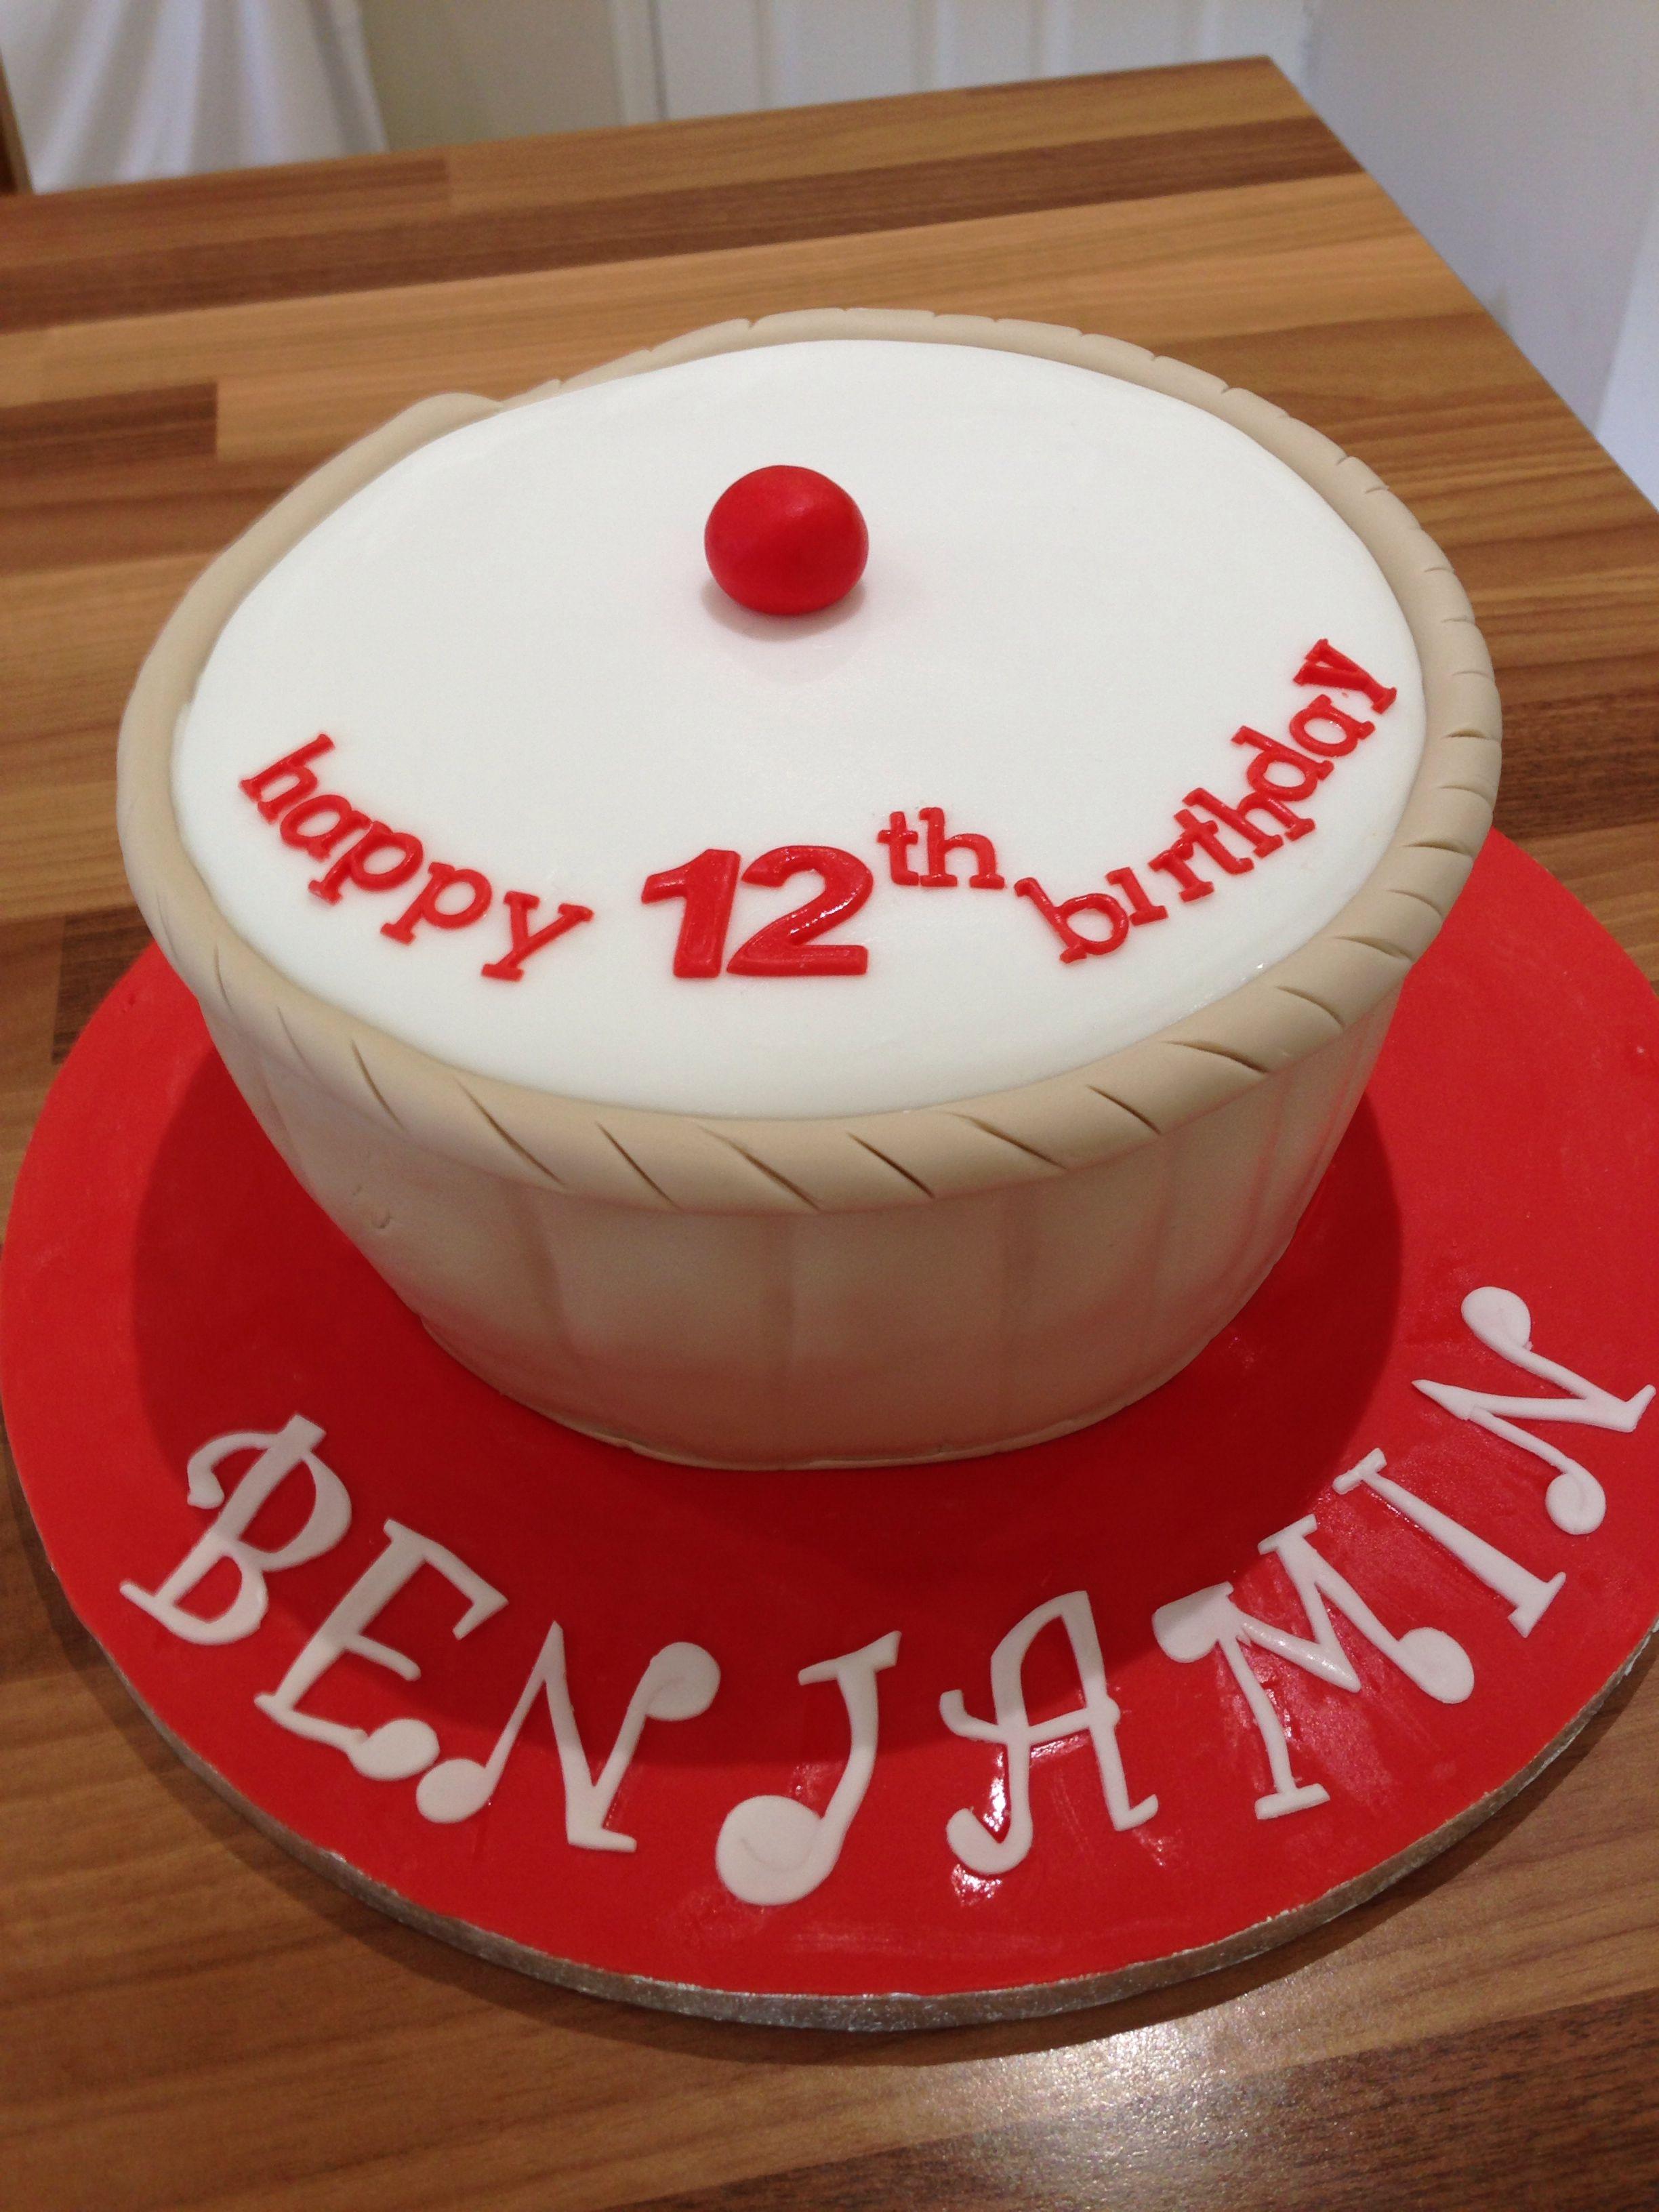 Wondrous Giant Cherry Bakewell Cake Cake Cherry Bakewell Cake Bakewell Cake Funny Birthday Cards Online Alyptdamsfinfo